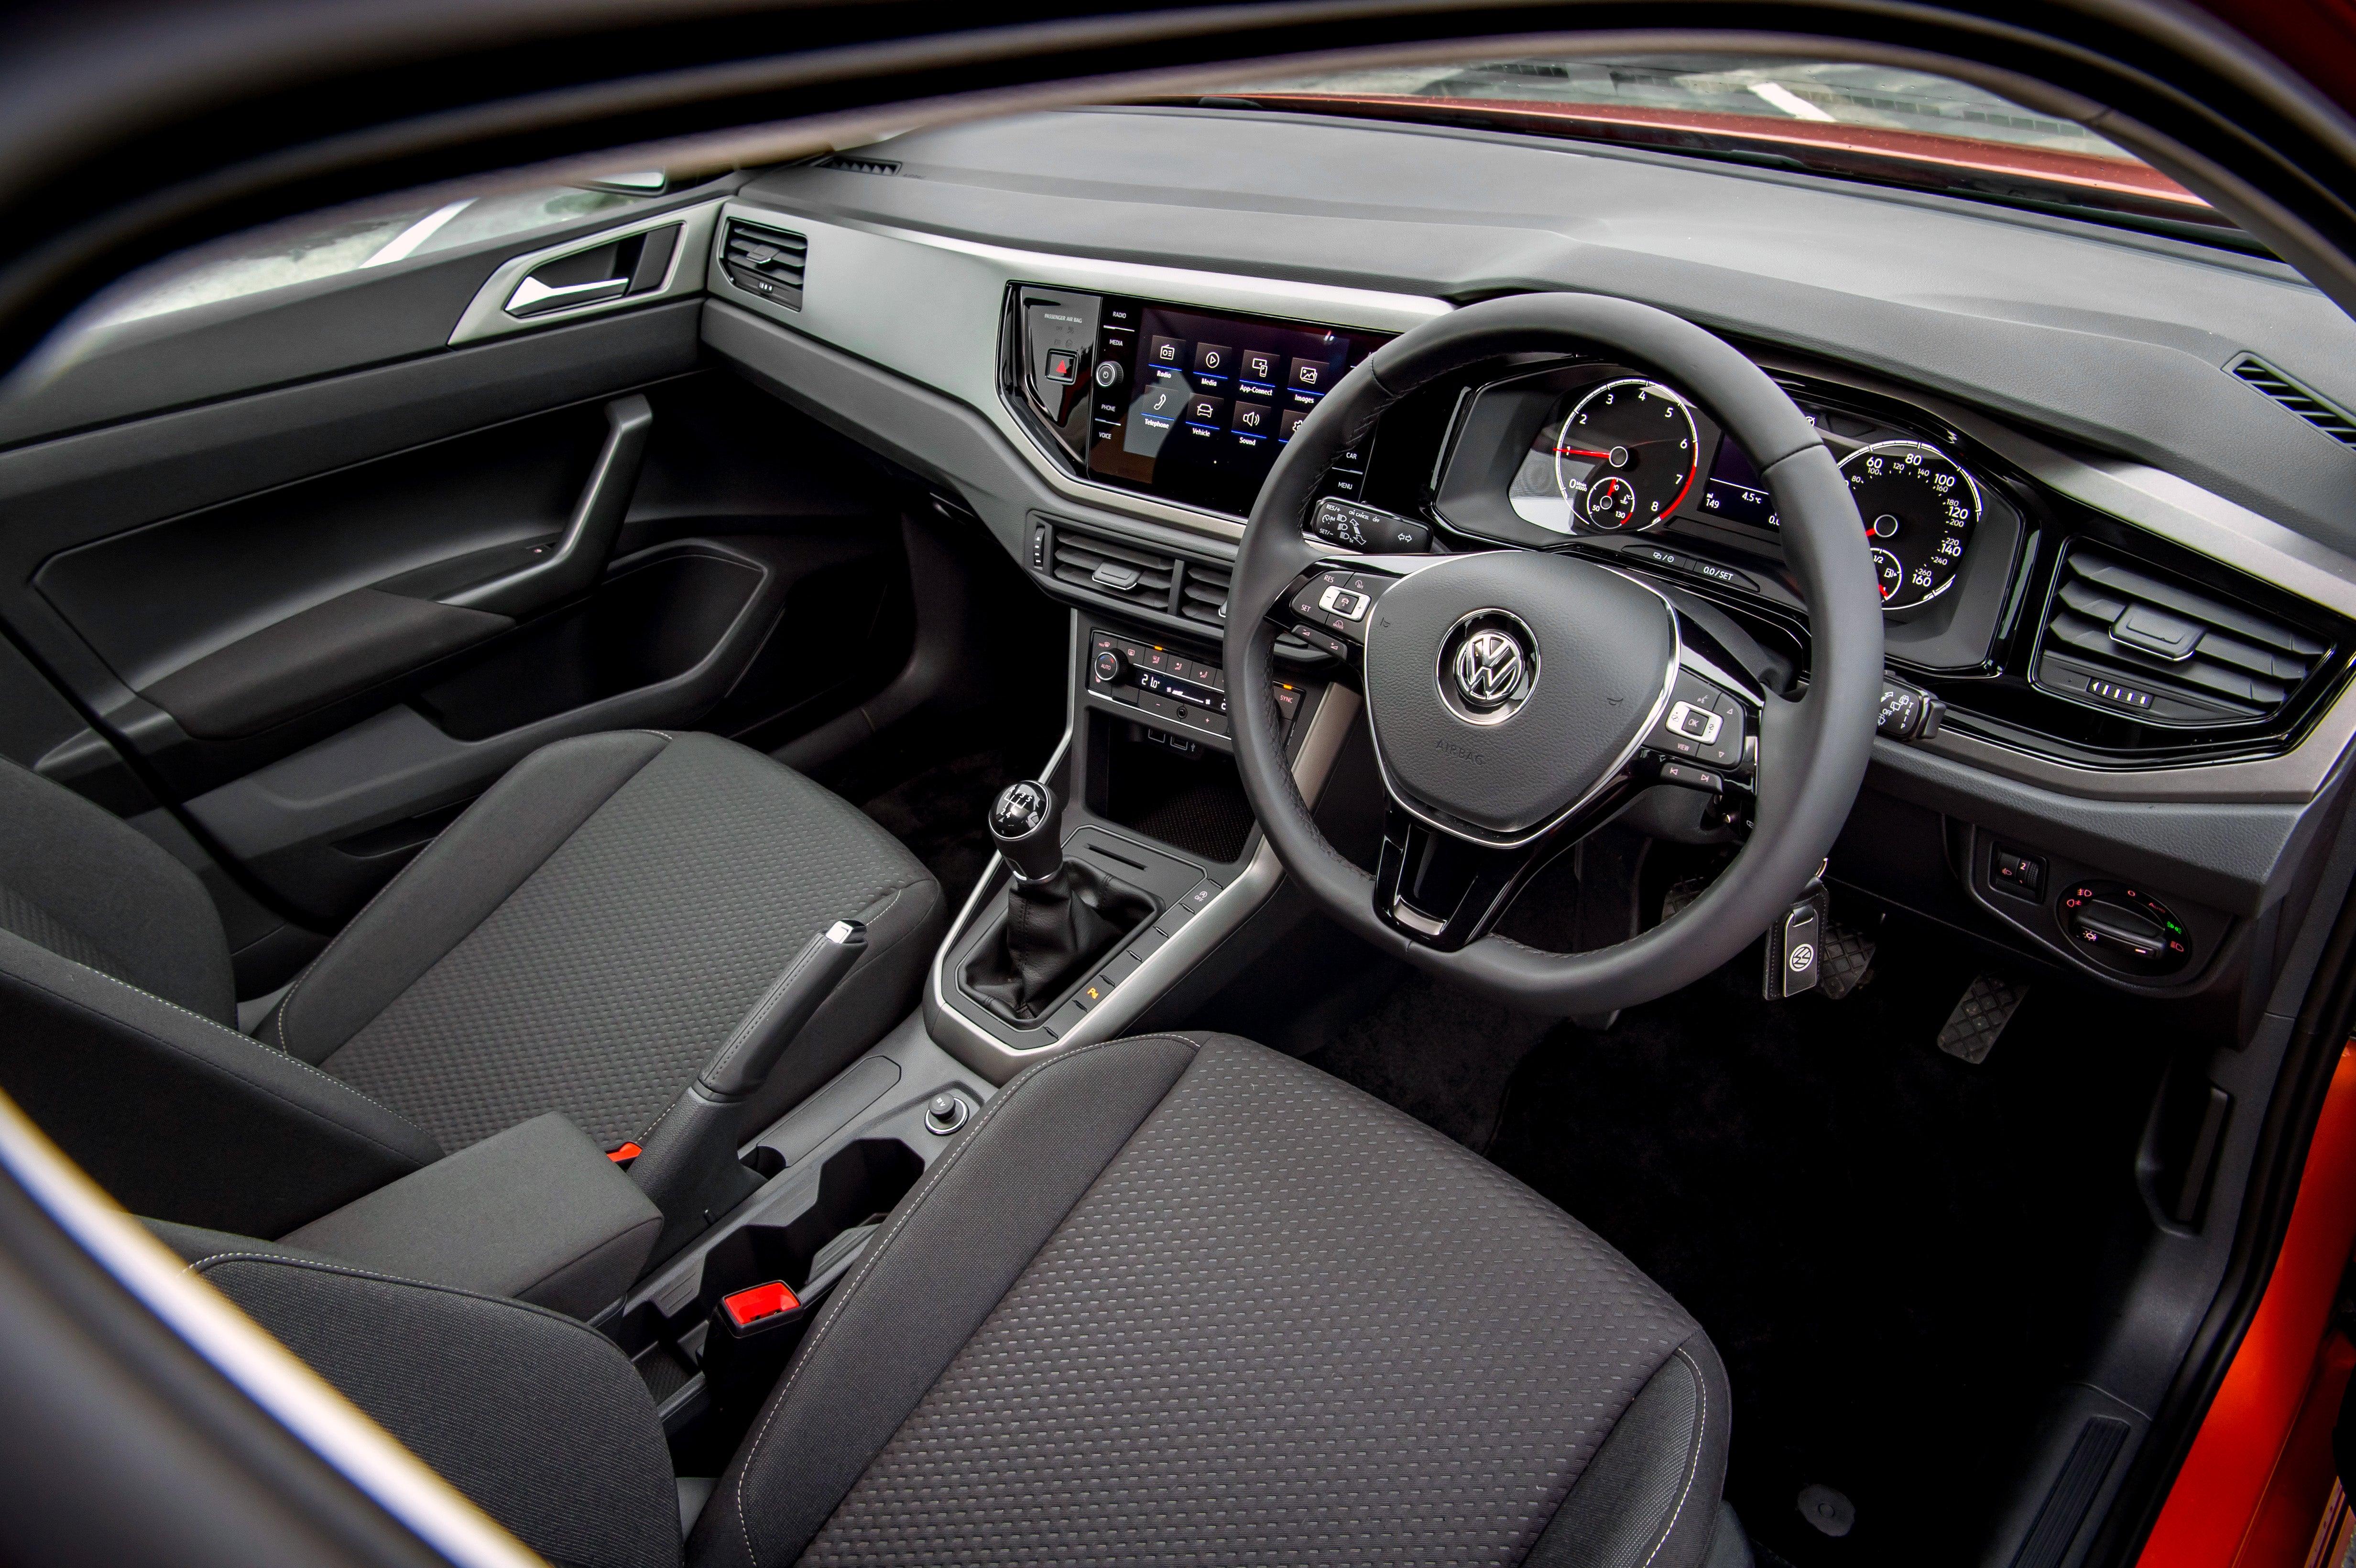 Volkswagen Polo Front Interior